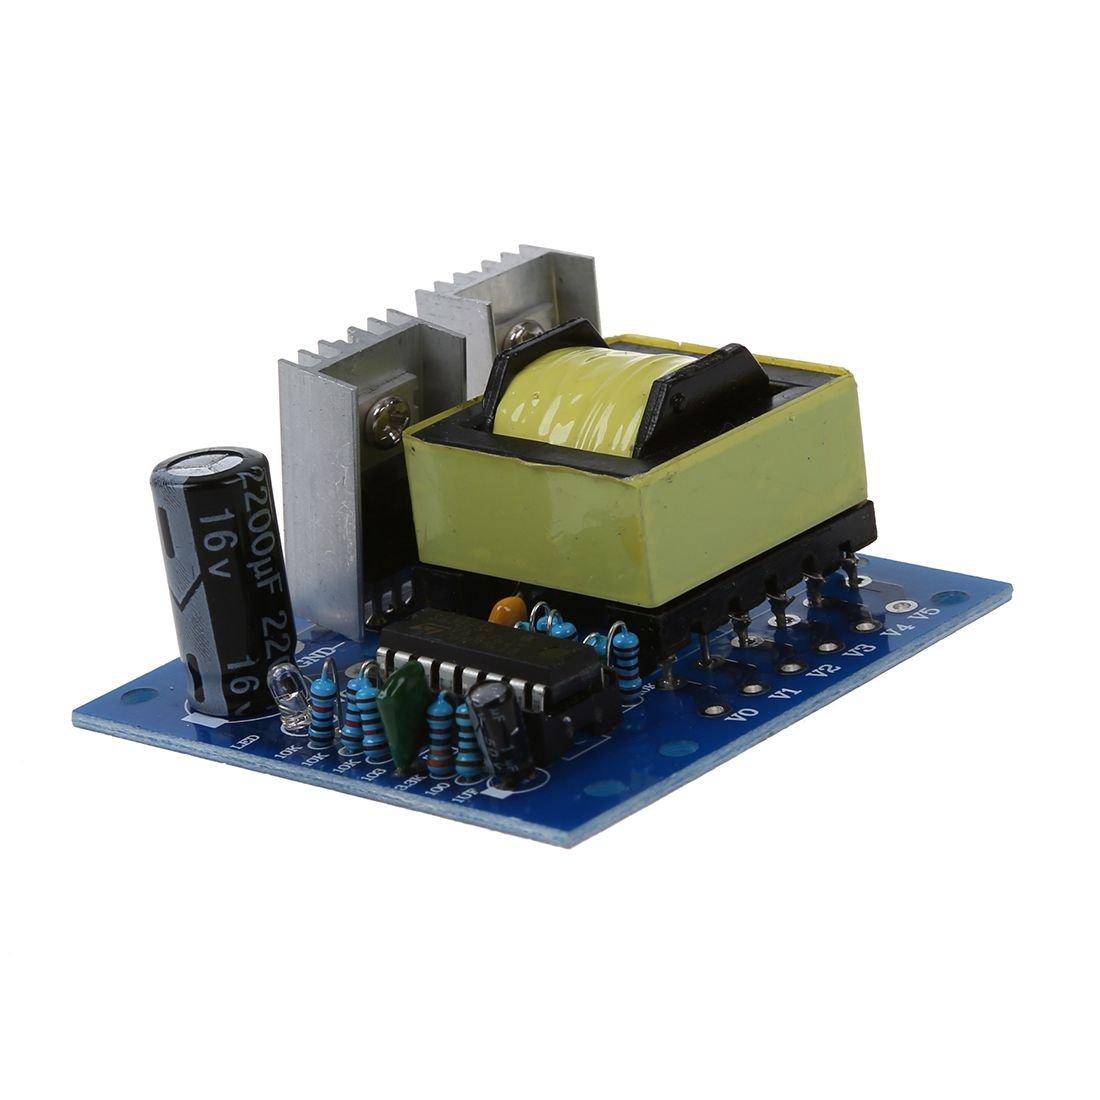 Inverter Boost Circuit Board Toogoor 150w Car Dc Usb Power Booster 12v To Ac 110v 220v Charger Converter Glassware Drinkware